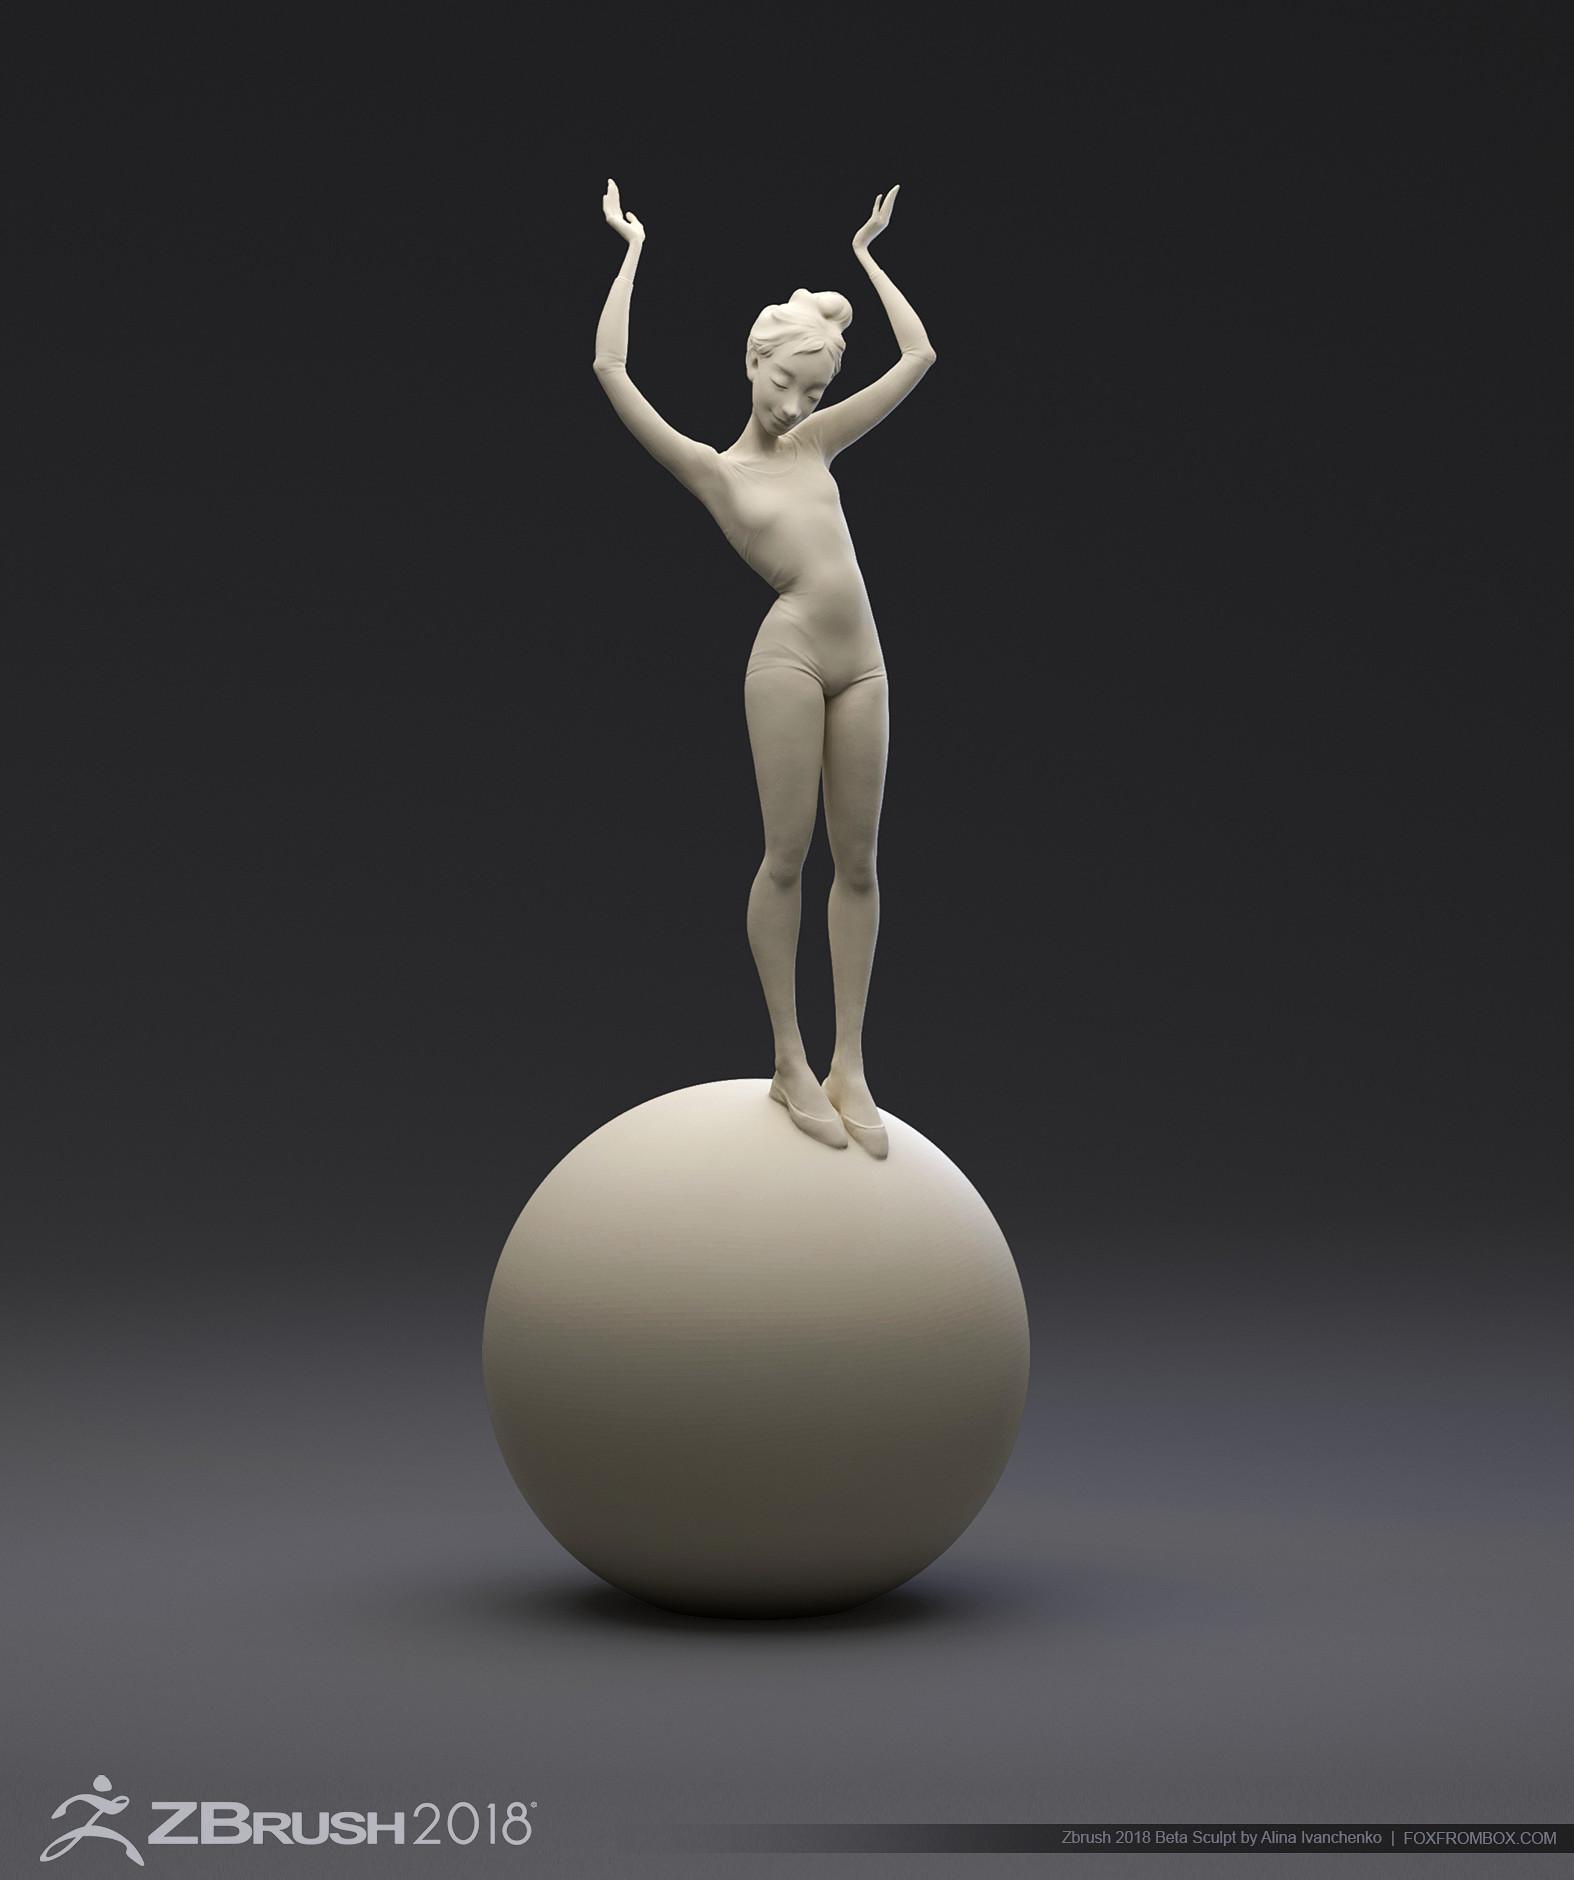 Alina ivanchenko shere sculpt keyshot01